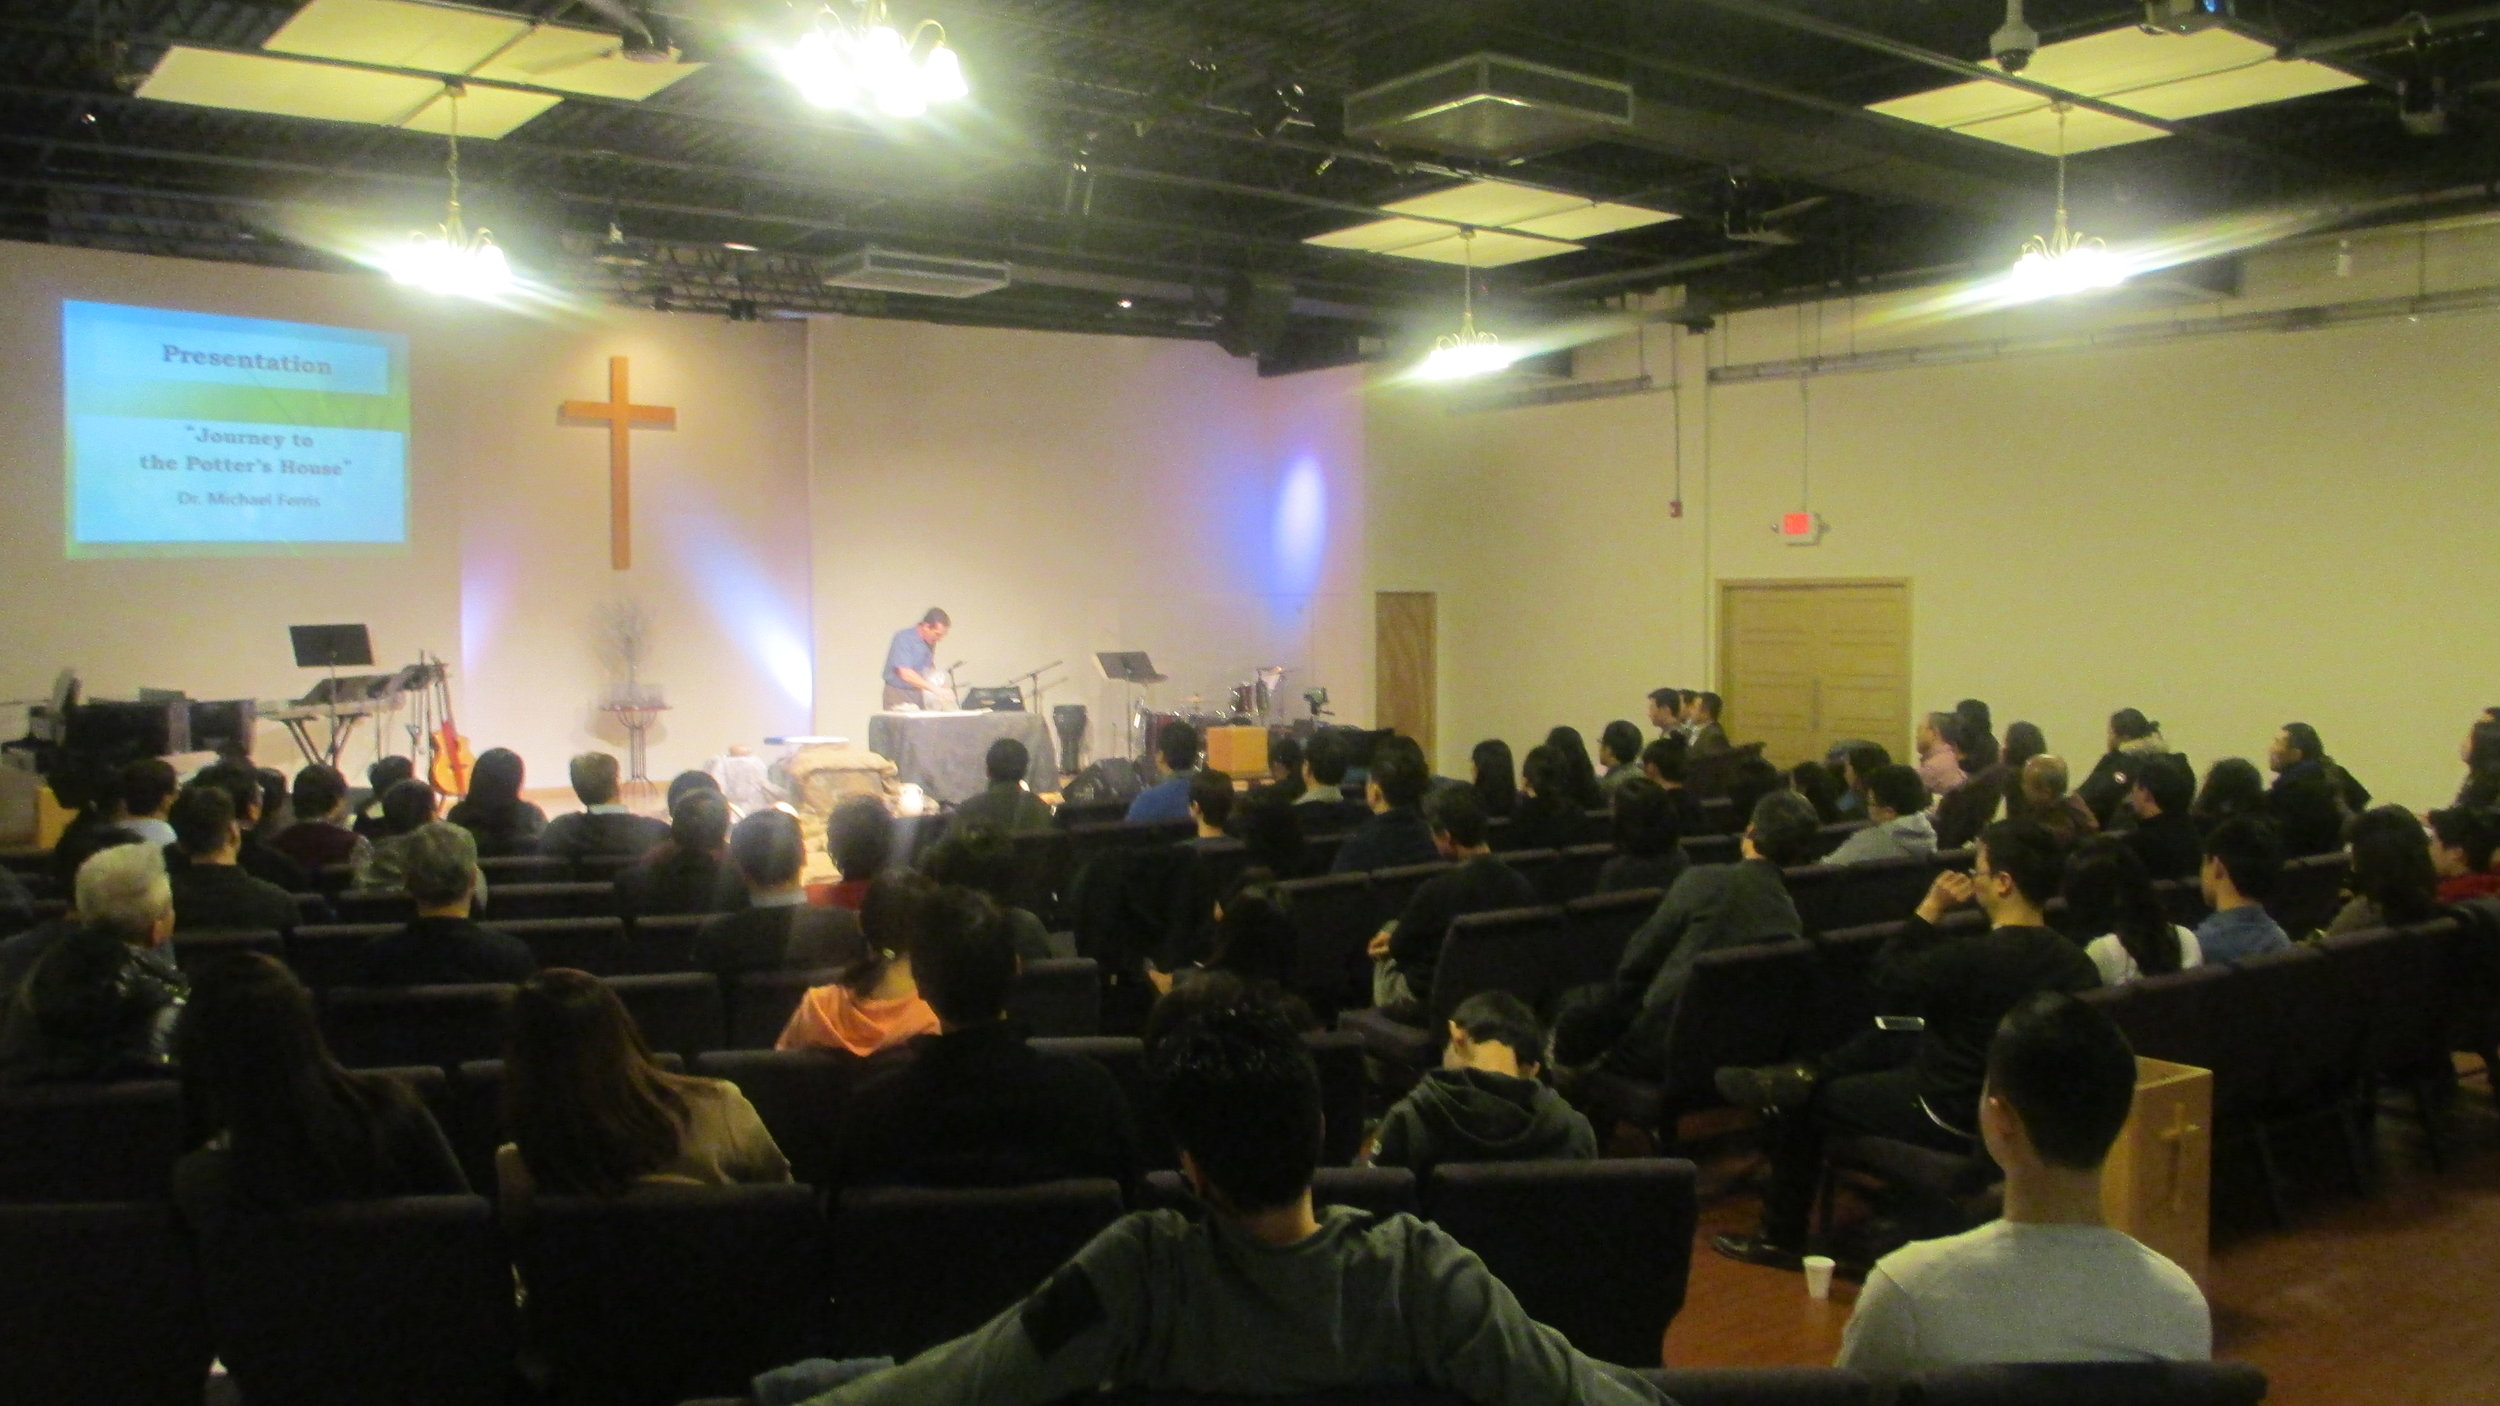 Riverside Community Church, Elmwood PK. NJ 006.JPG